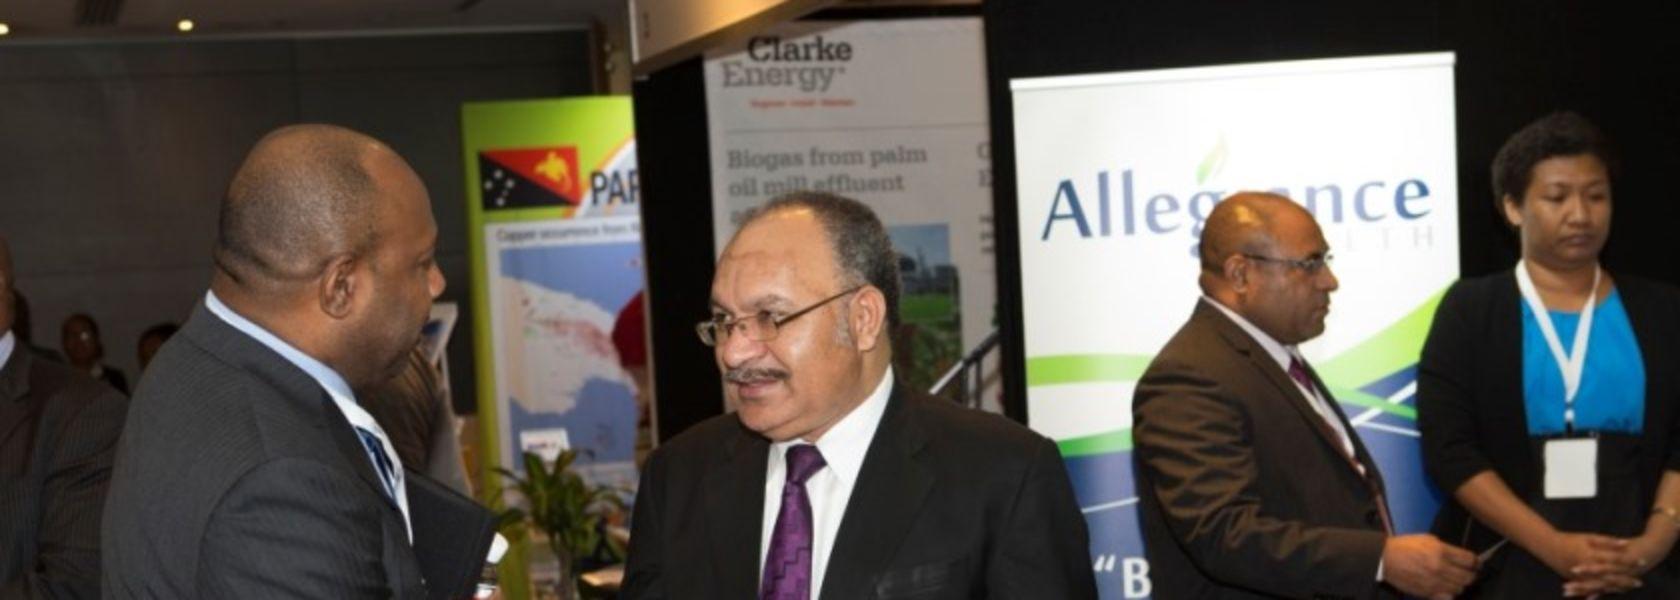 APEC high on agenda at mining expo.